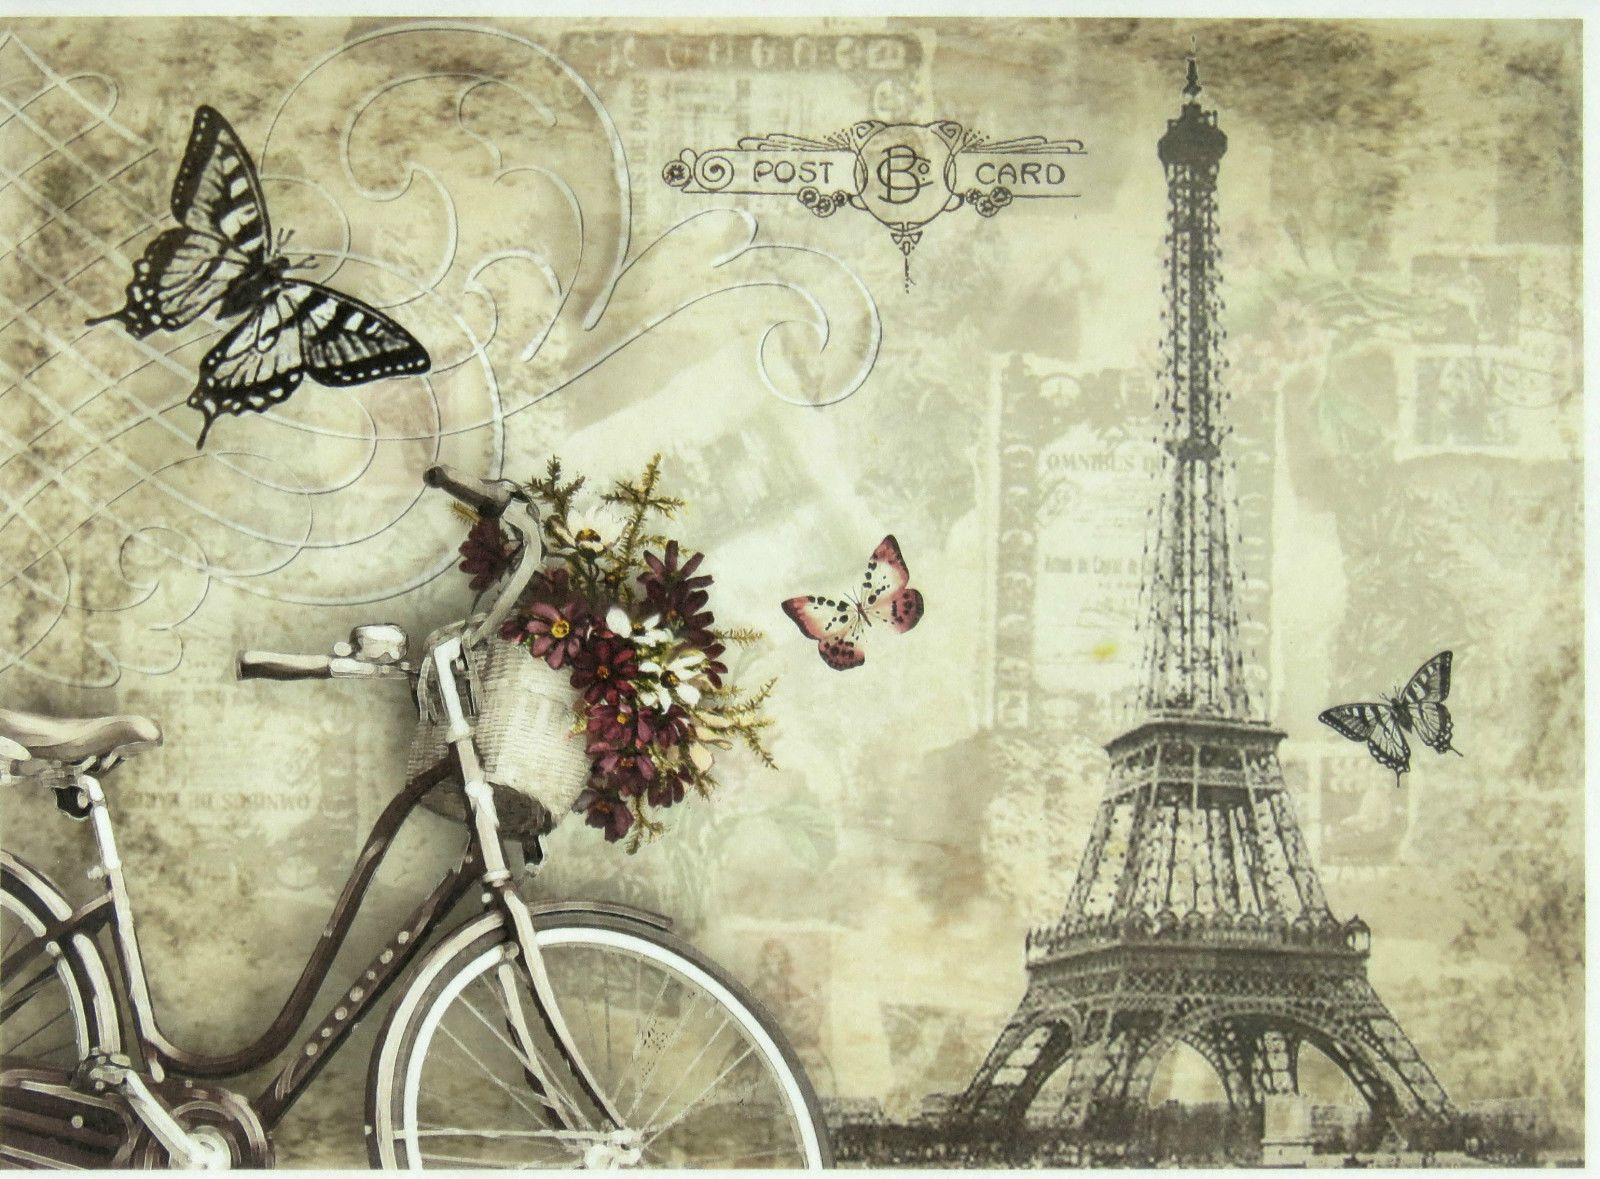 Papel De Arroz Para Decoupage Scrapbook Craft Amor en París